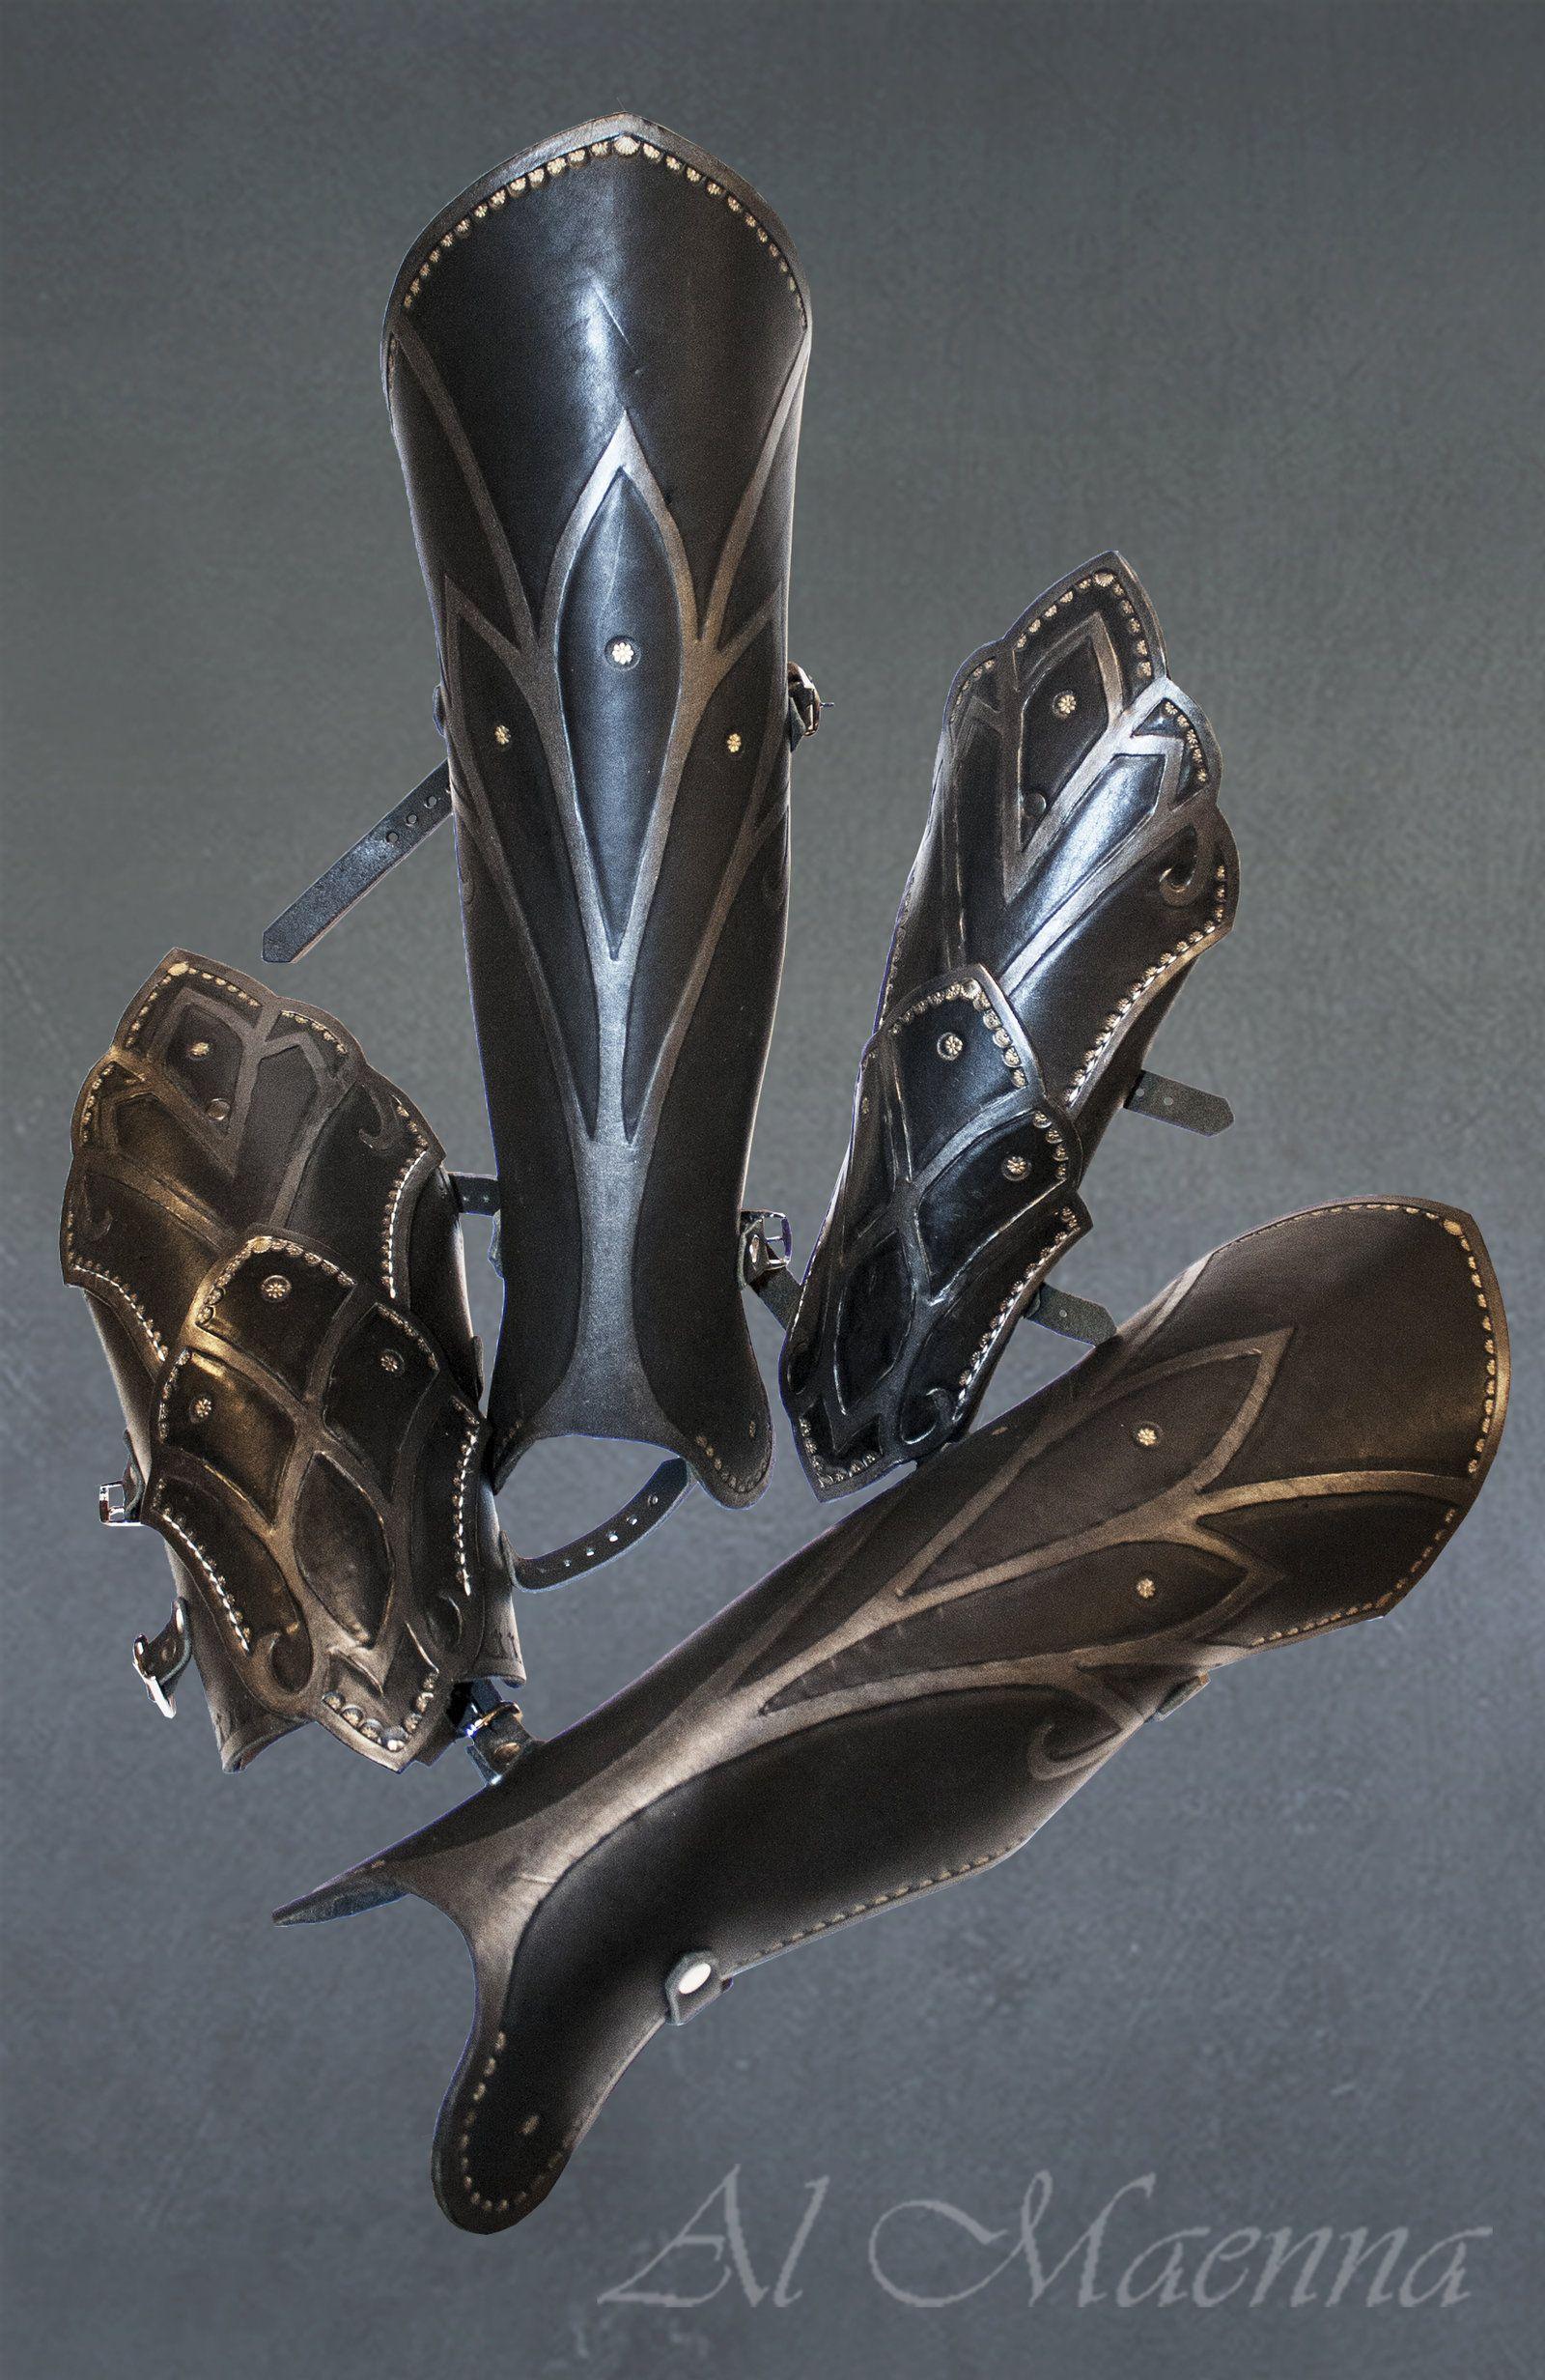 Elven arm and leg armor by Shattan deviantart com on @deviantART